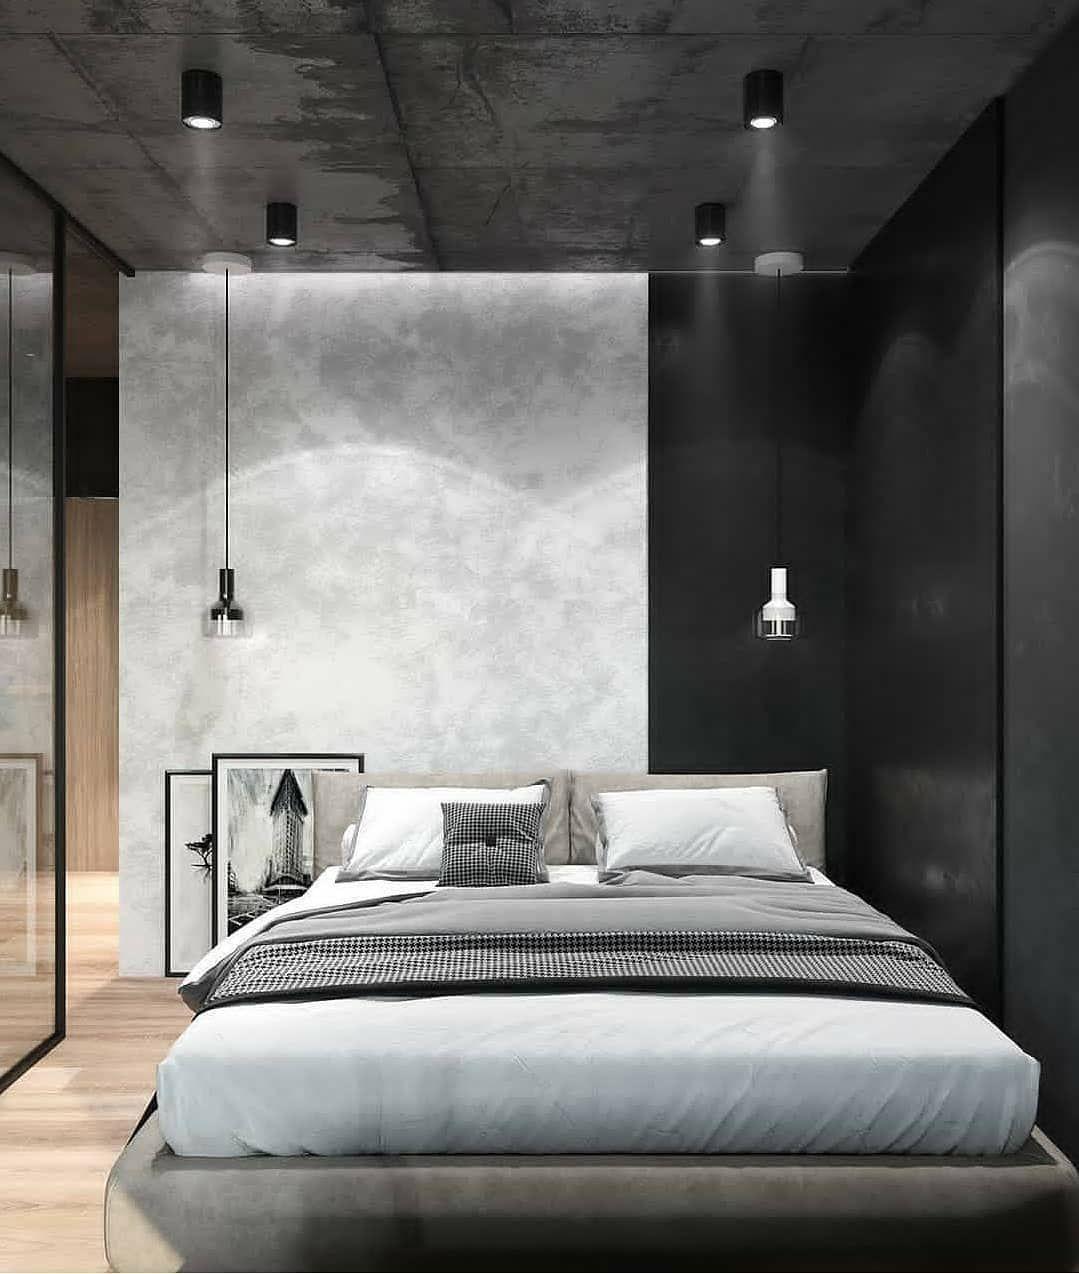 Pin by Ruslana Berest on Дизайн квартиры Unique bedroom